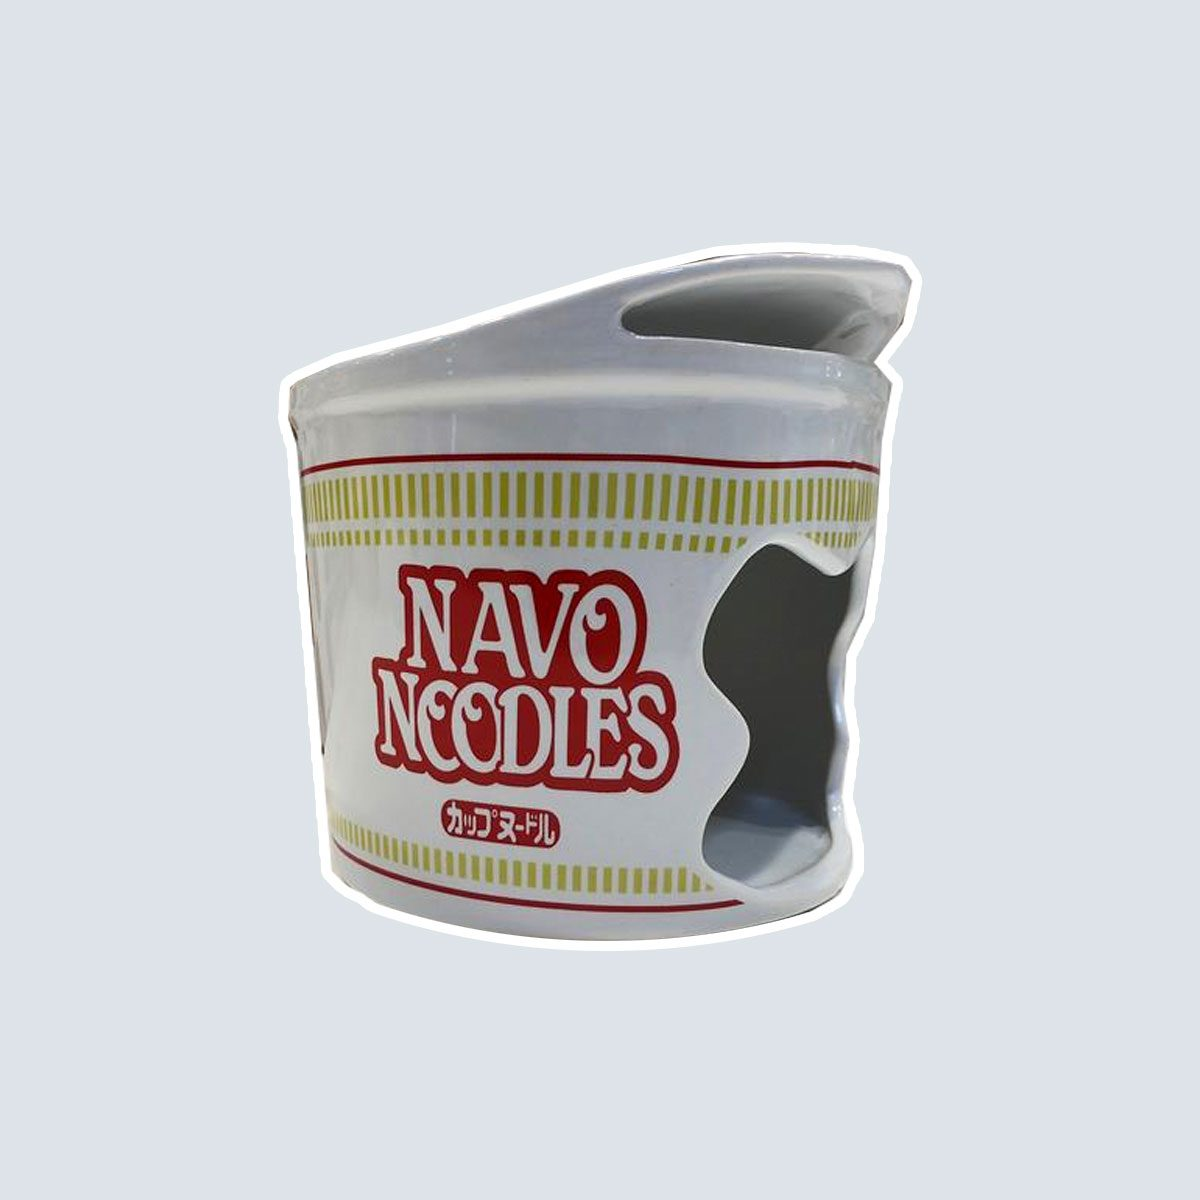 Navo Noodles Hamster Hideout